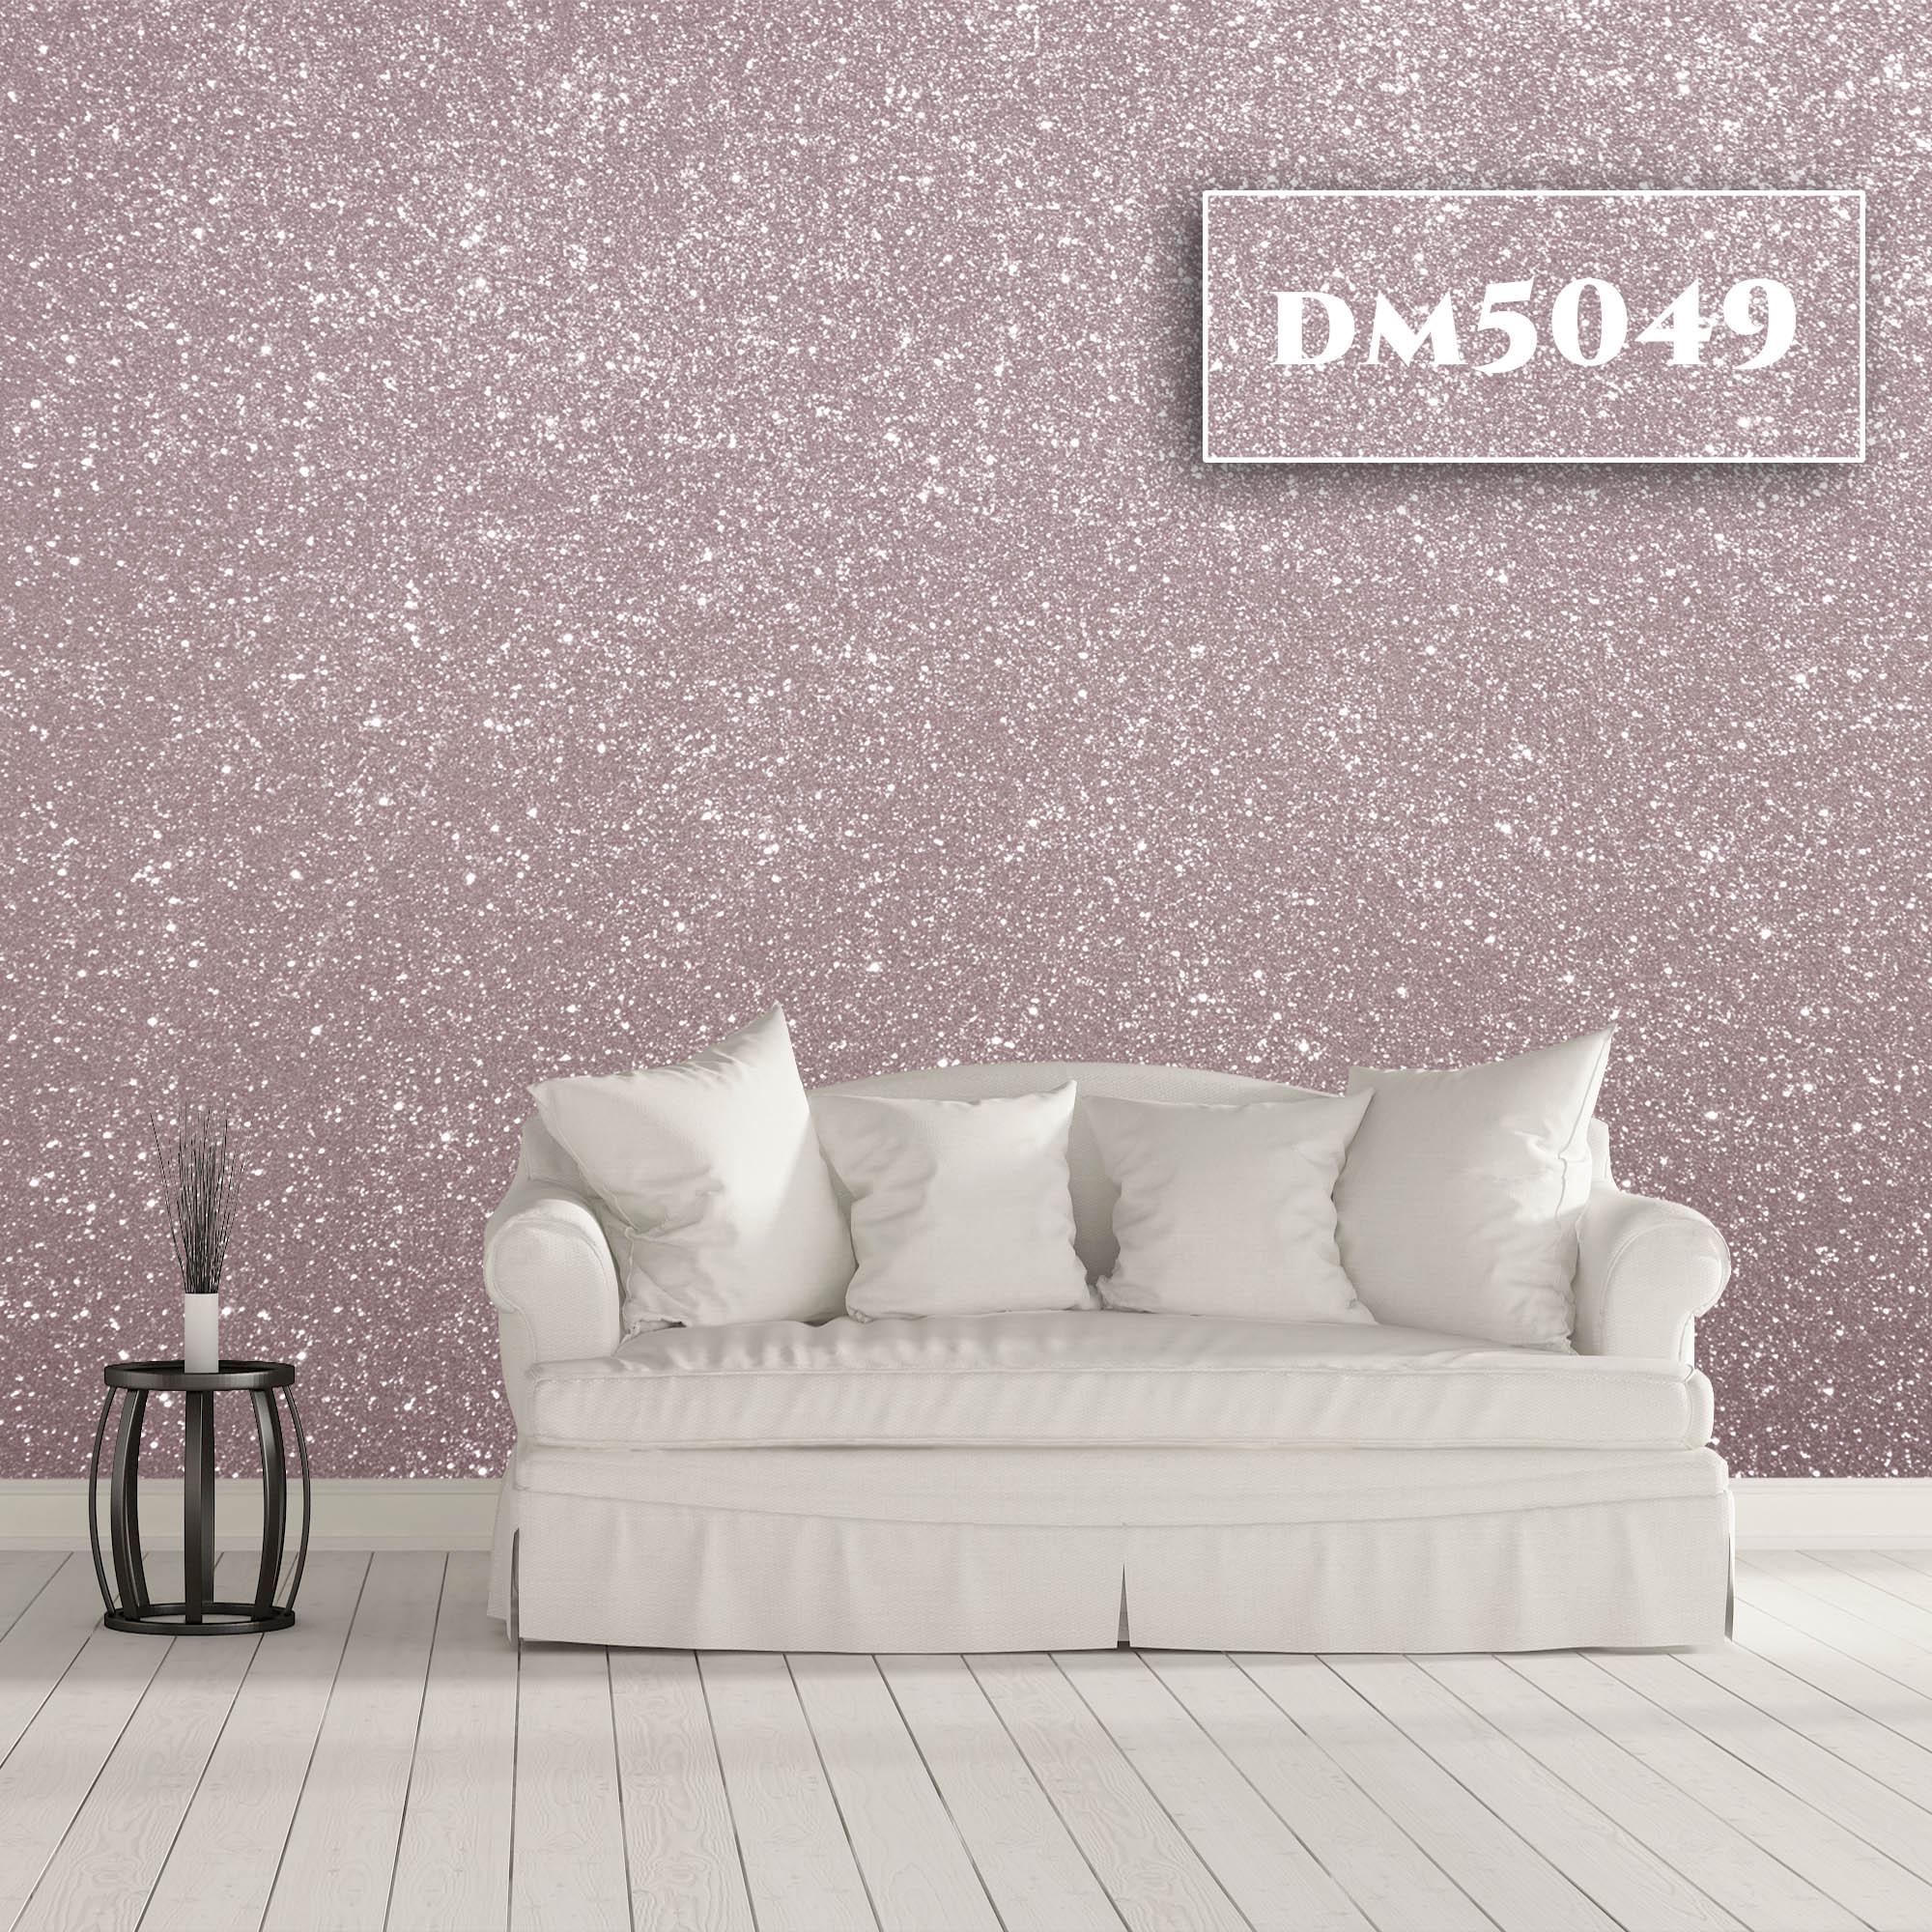 DM5049